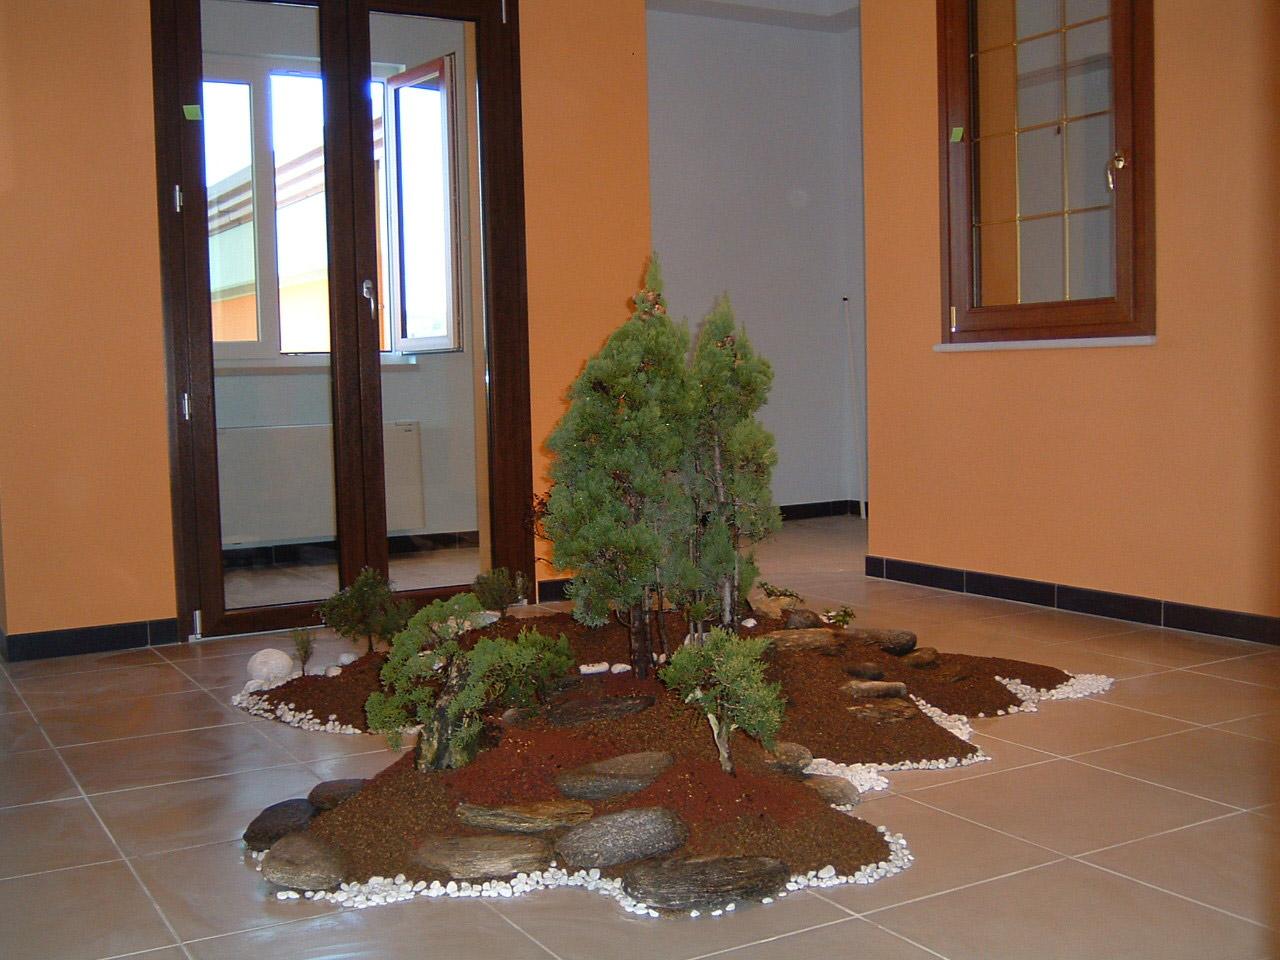 Giardini in miniatura gallery of riciclare i vasi rotti for Giardini in miniatura giapponesi